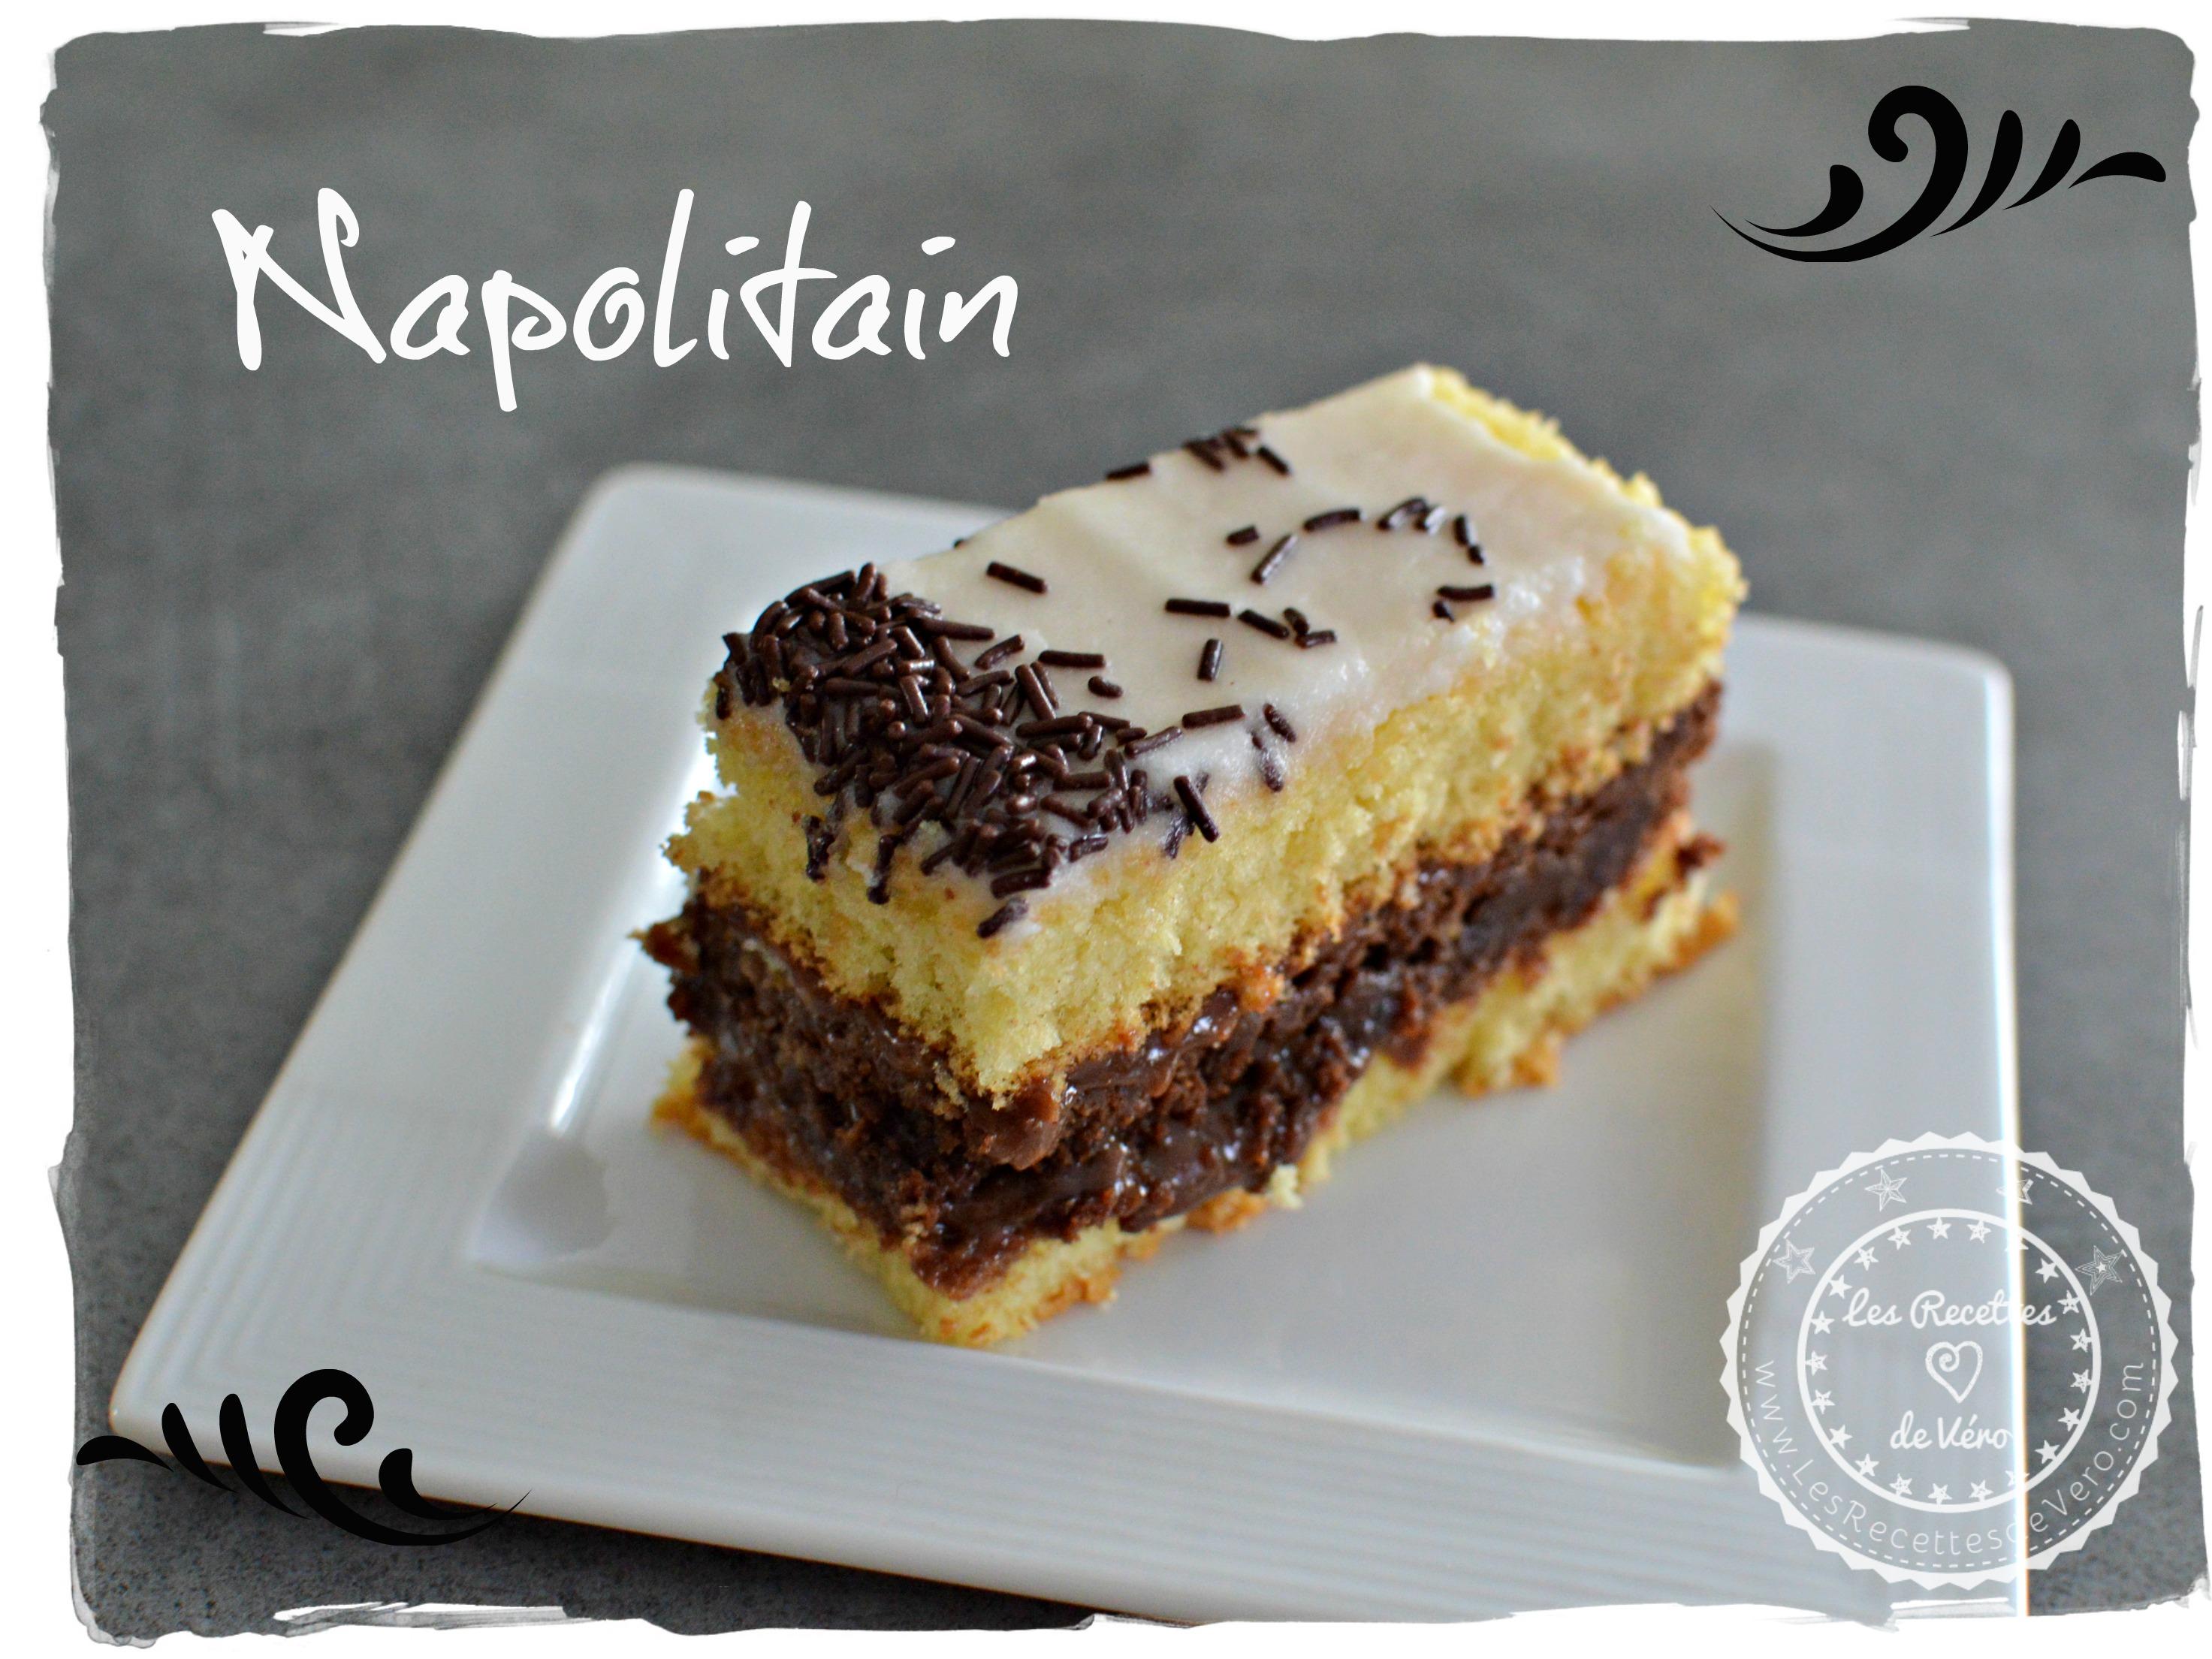 DSC_3146 Napolitain